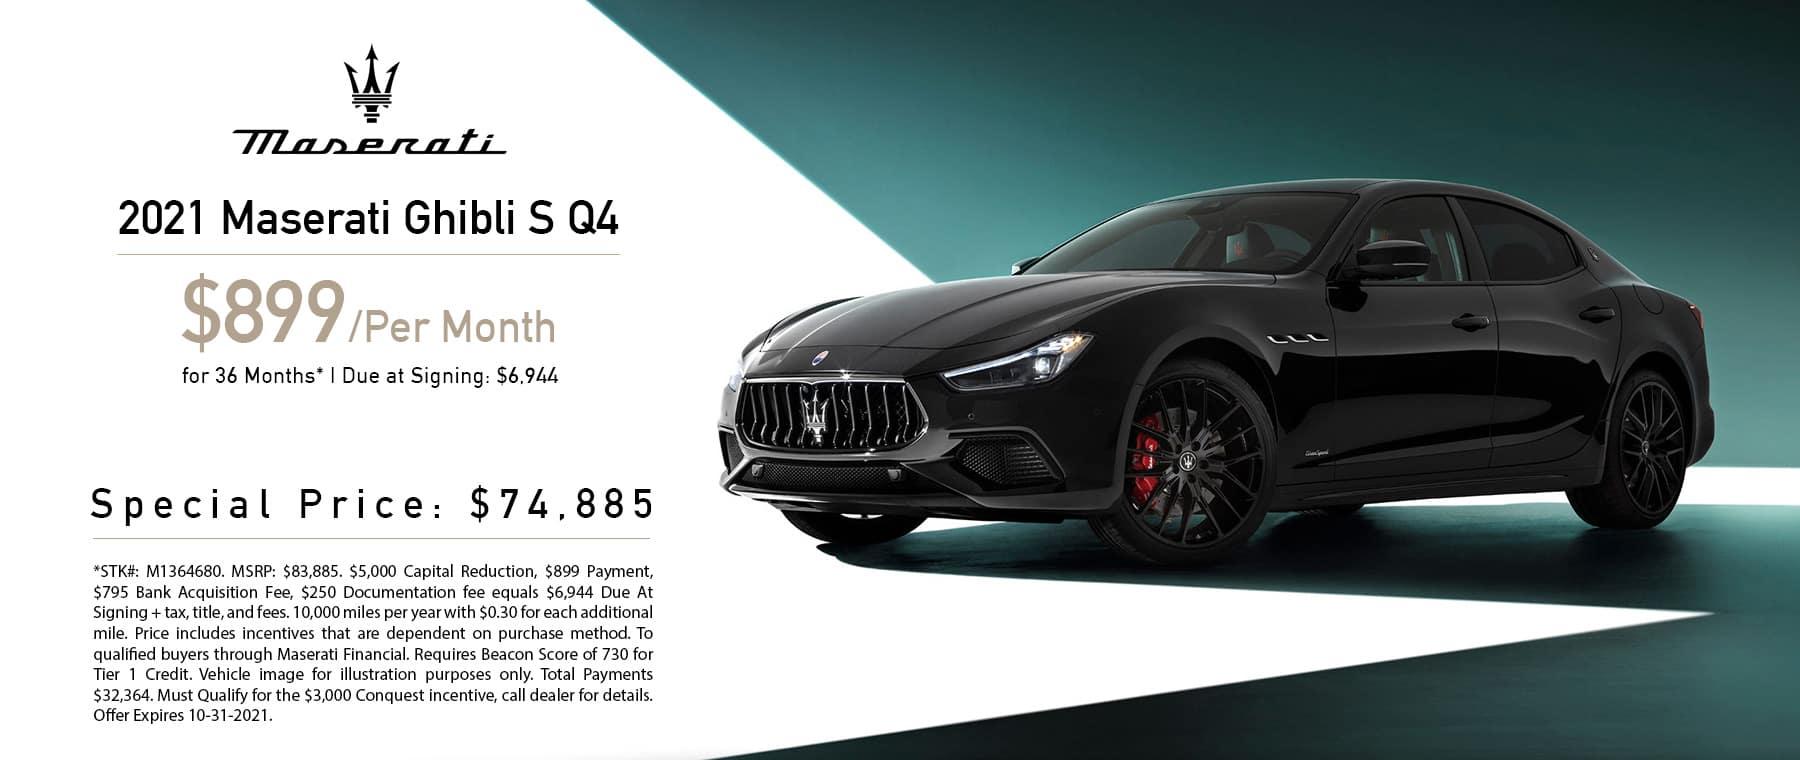 Maserati_2021_Ghibli_Slide_Oct2021_1